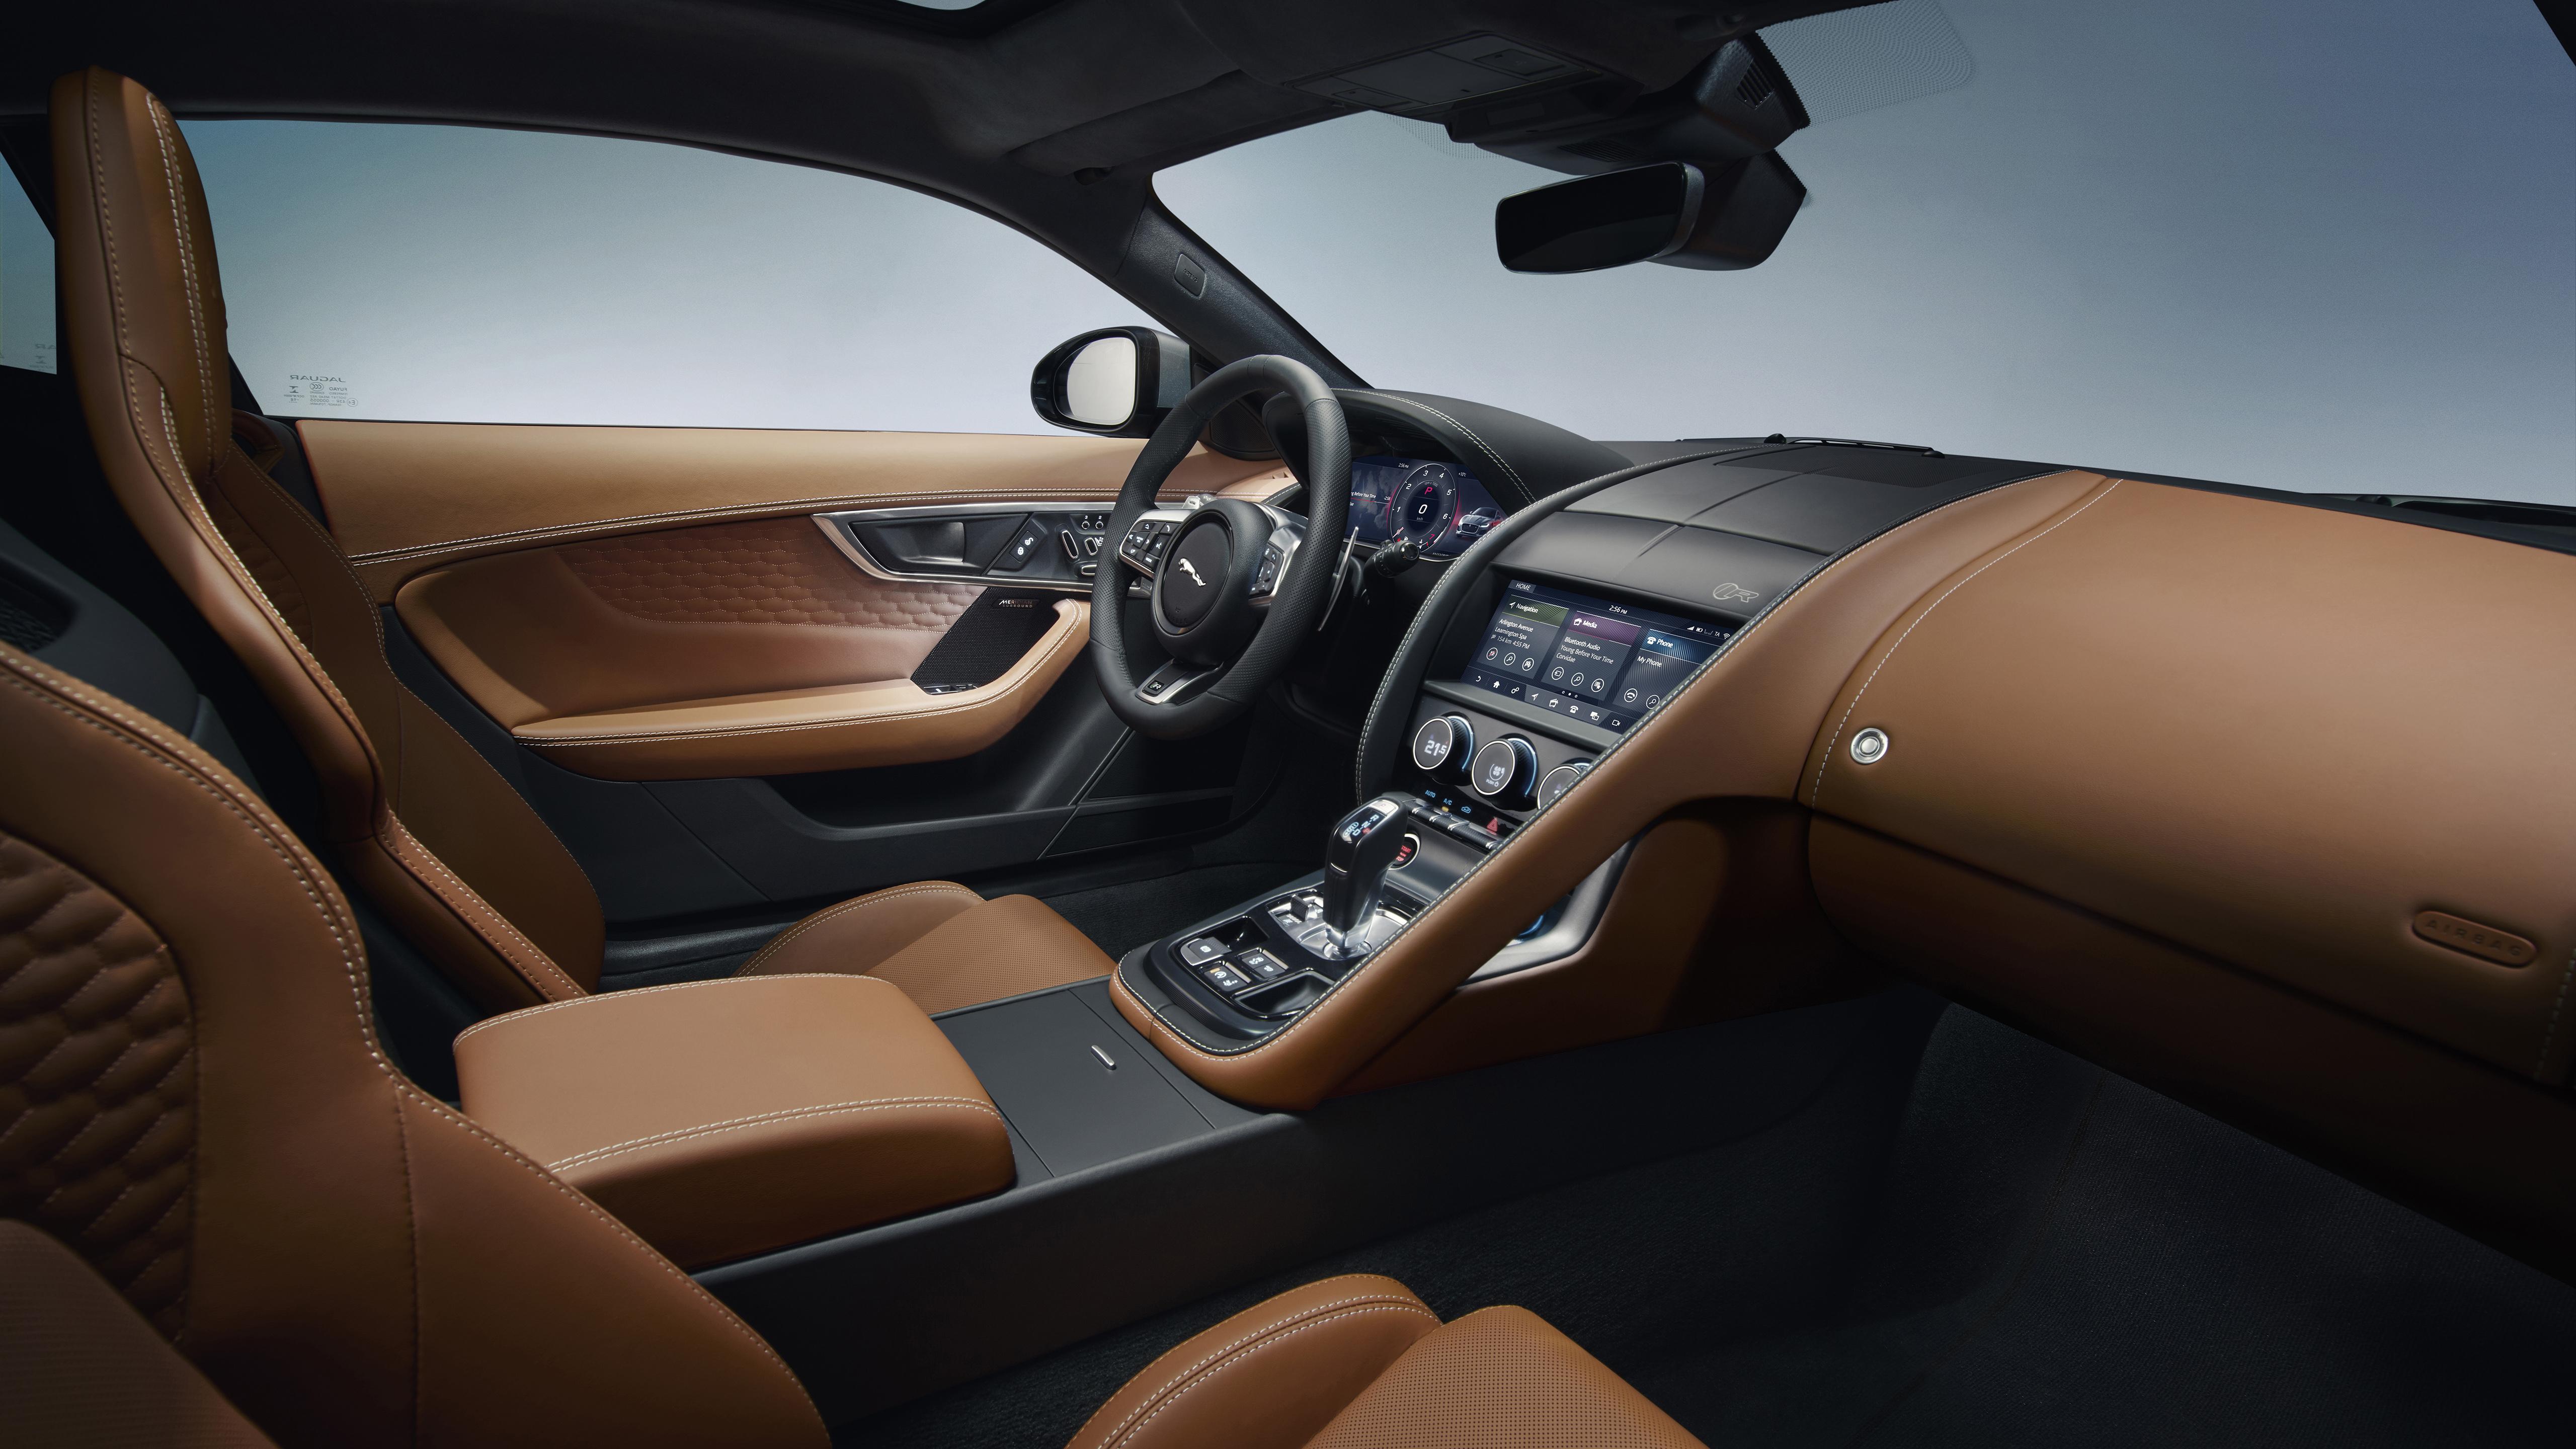 Jaguar F Type R Coupe 2020 4k 3 Wallpaper Hd Car Wallpapers Id 15533